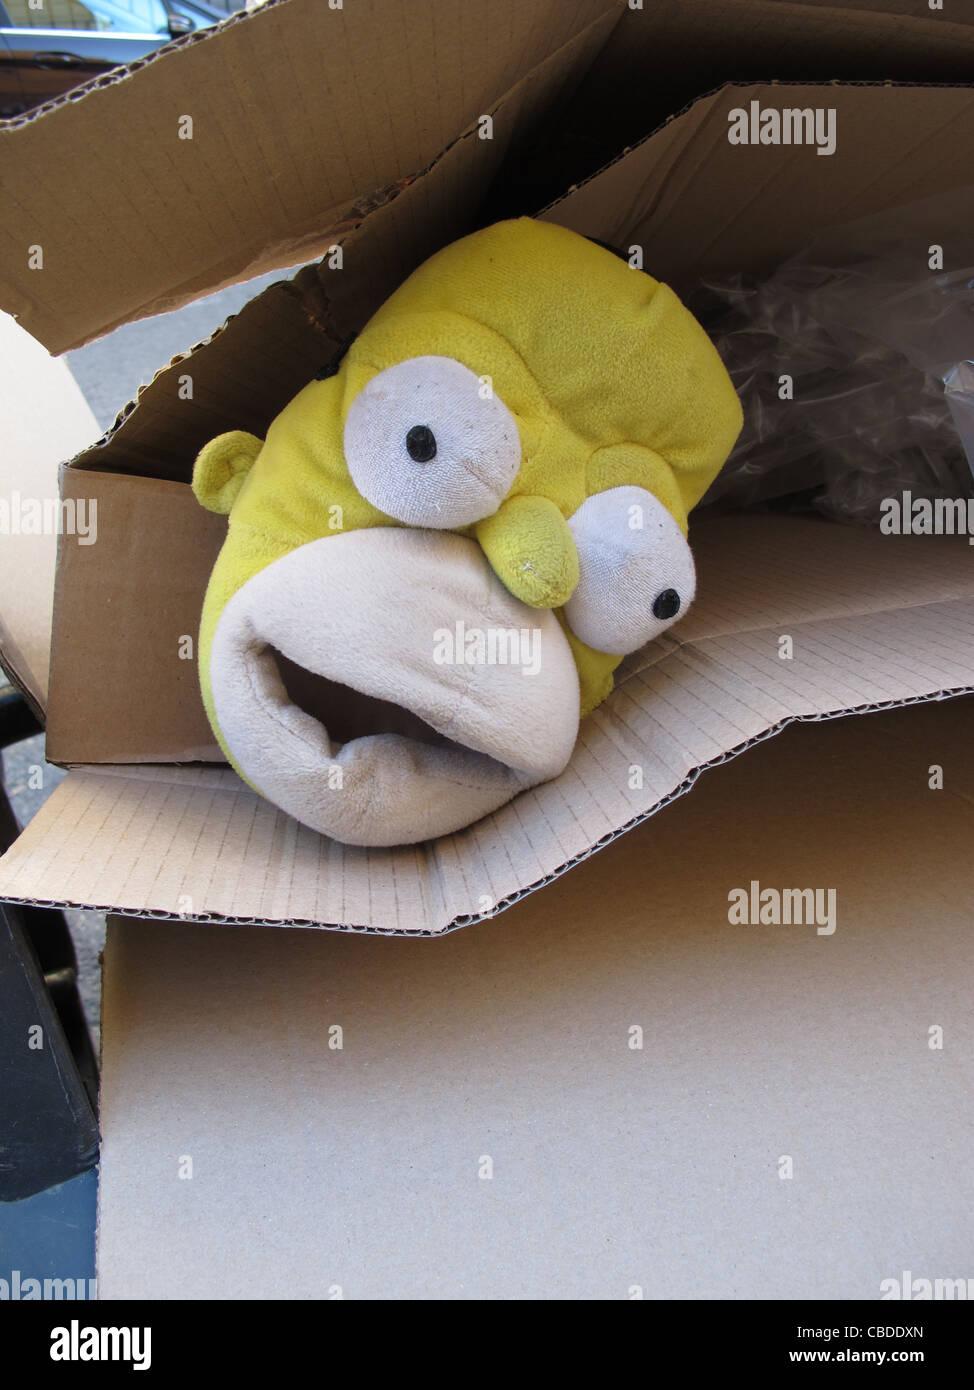 bart simpson slipper shoe dumped in garbage rubbish bin in street road in city town - Stock Image